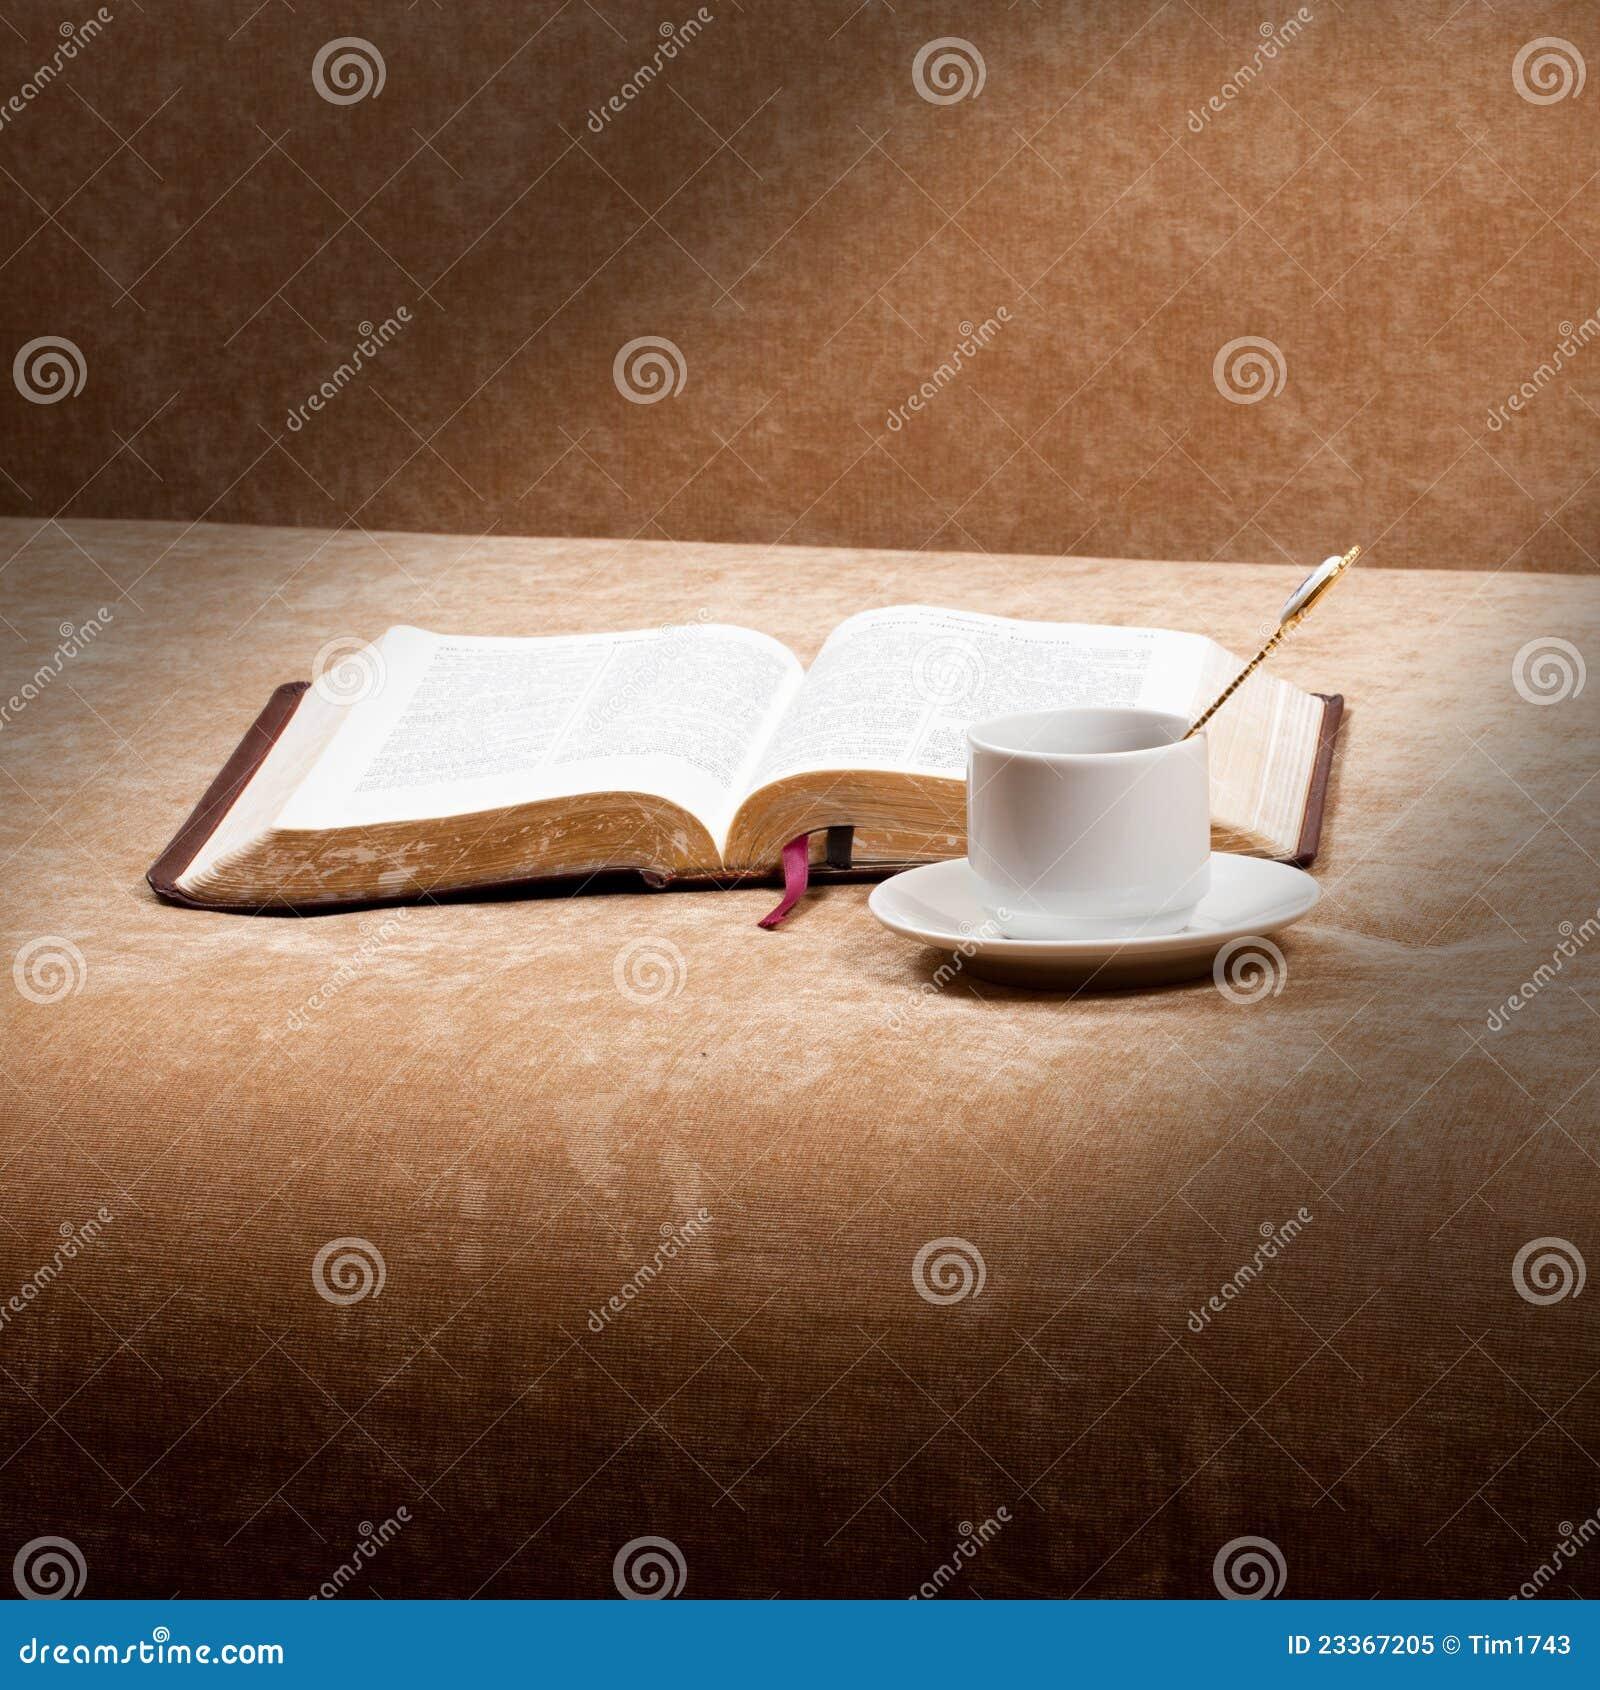 Morning Bible Reading Royalty Free Stock Photo - Image ...